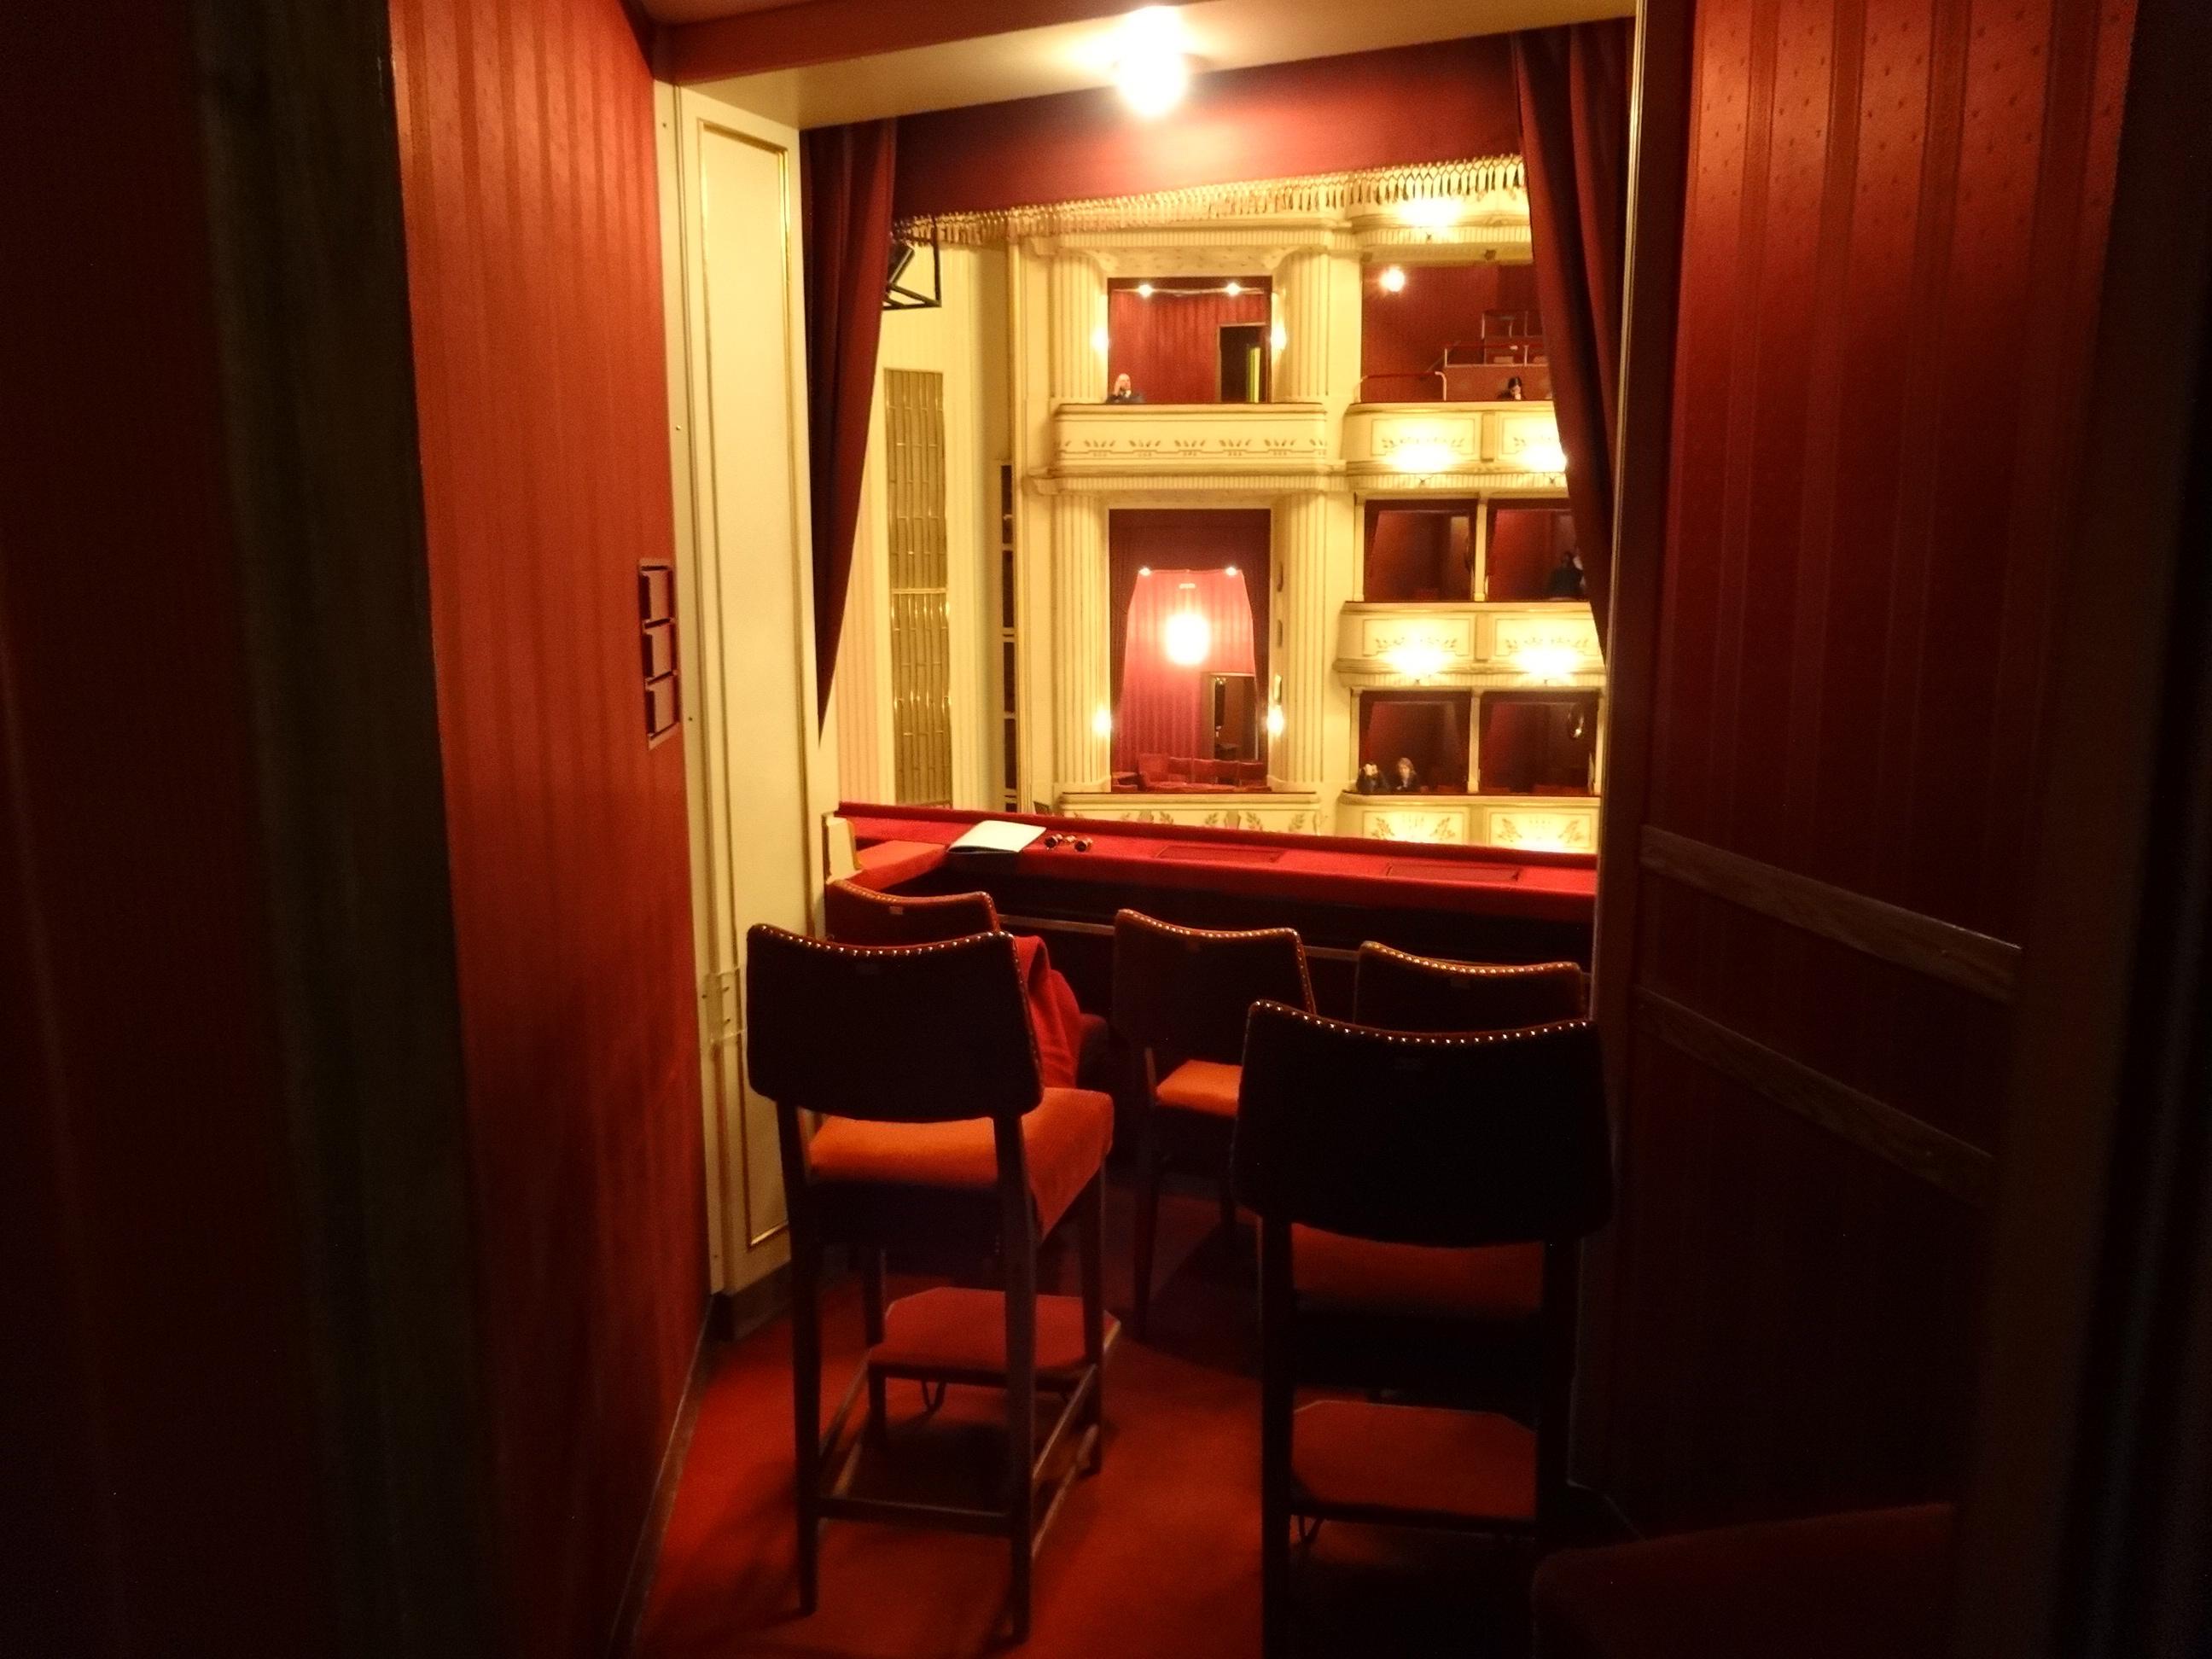 Loge Staatsoper Wien / box at Vienna State Opera